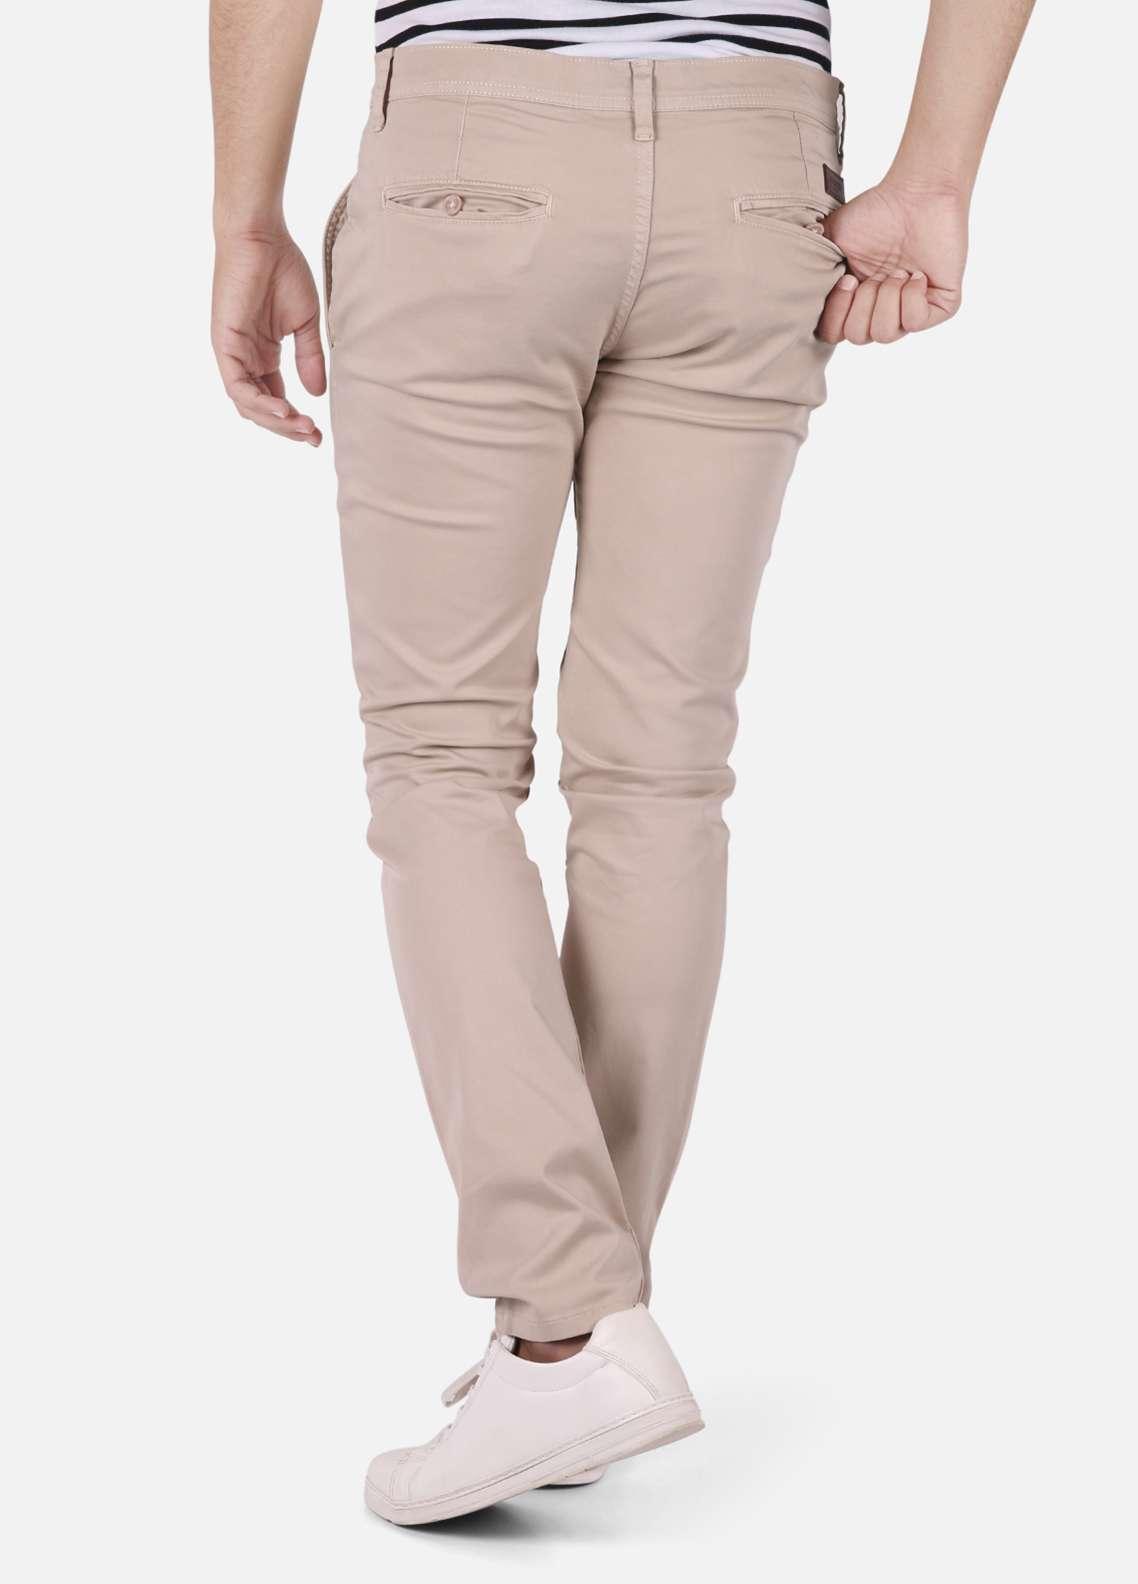 Furor  Chino Pants for Men - Sand FRM18C FMBCP18-007